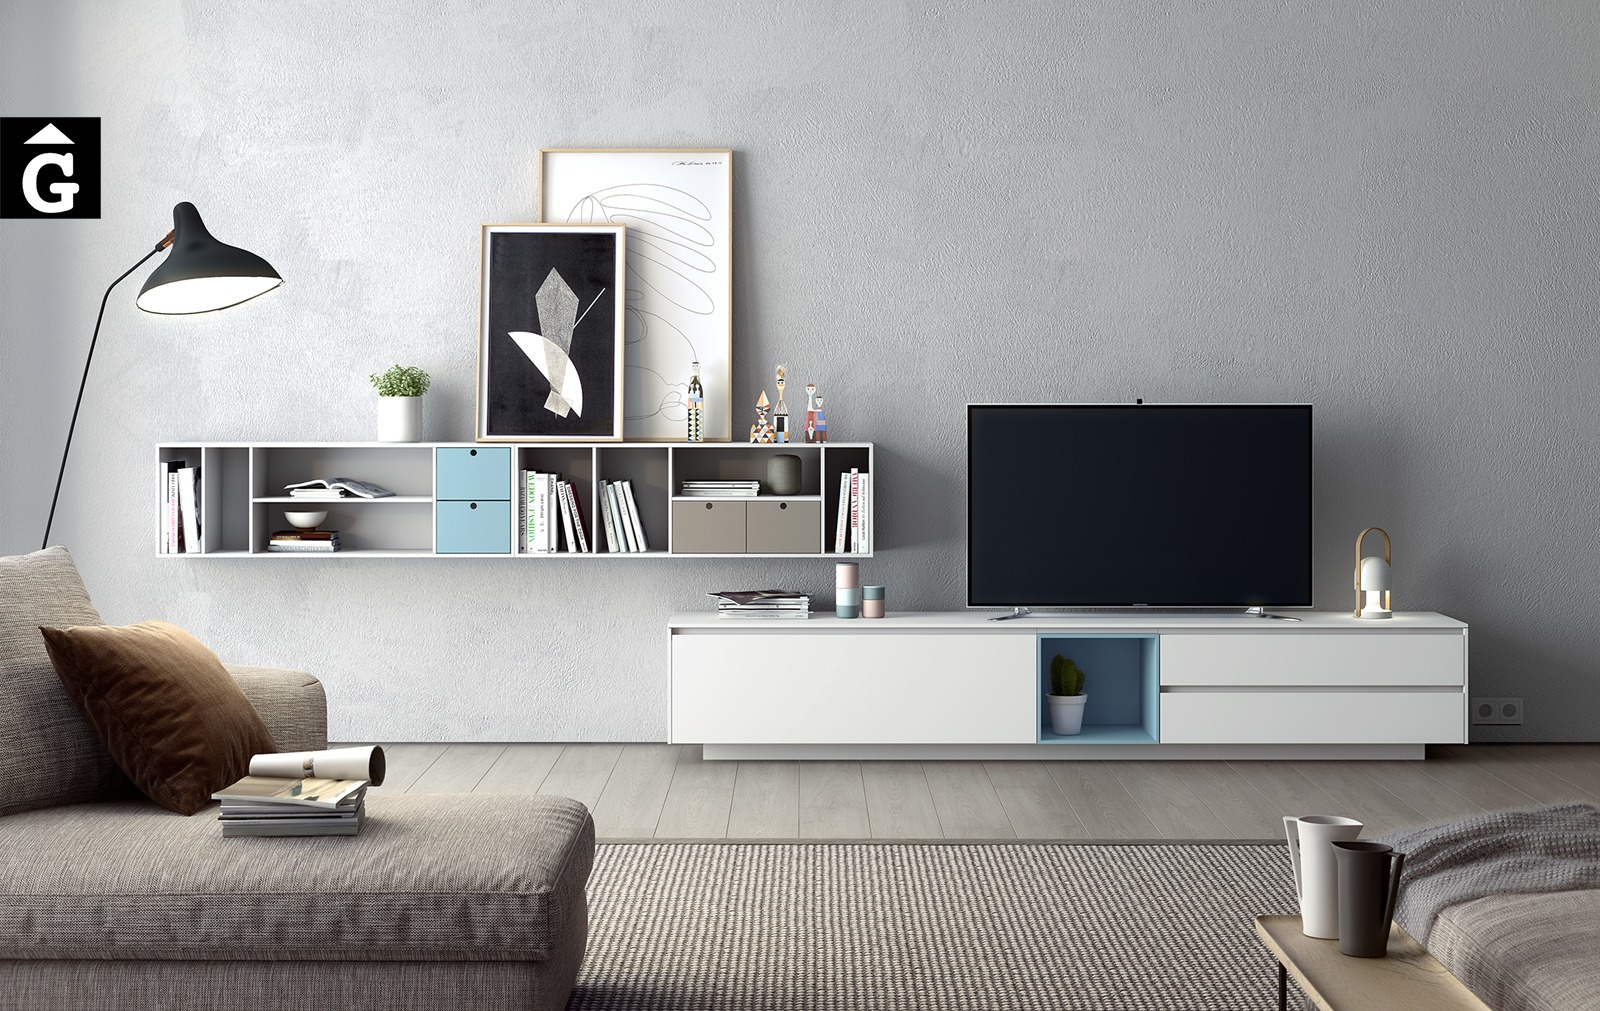 Moble Area Tv laca mate blanca, blava i sorra | Programa de mobiliari Area | mobles Ciurans | mobles Gifreu